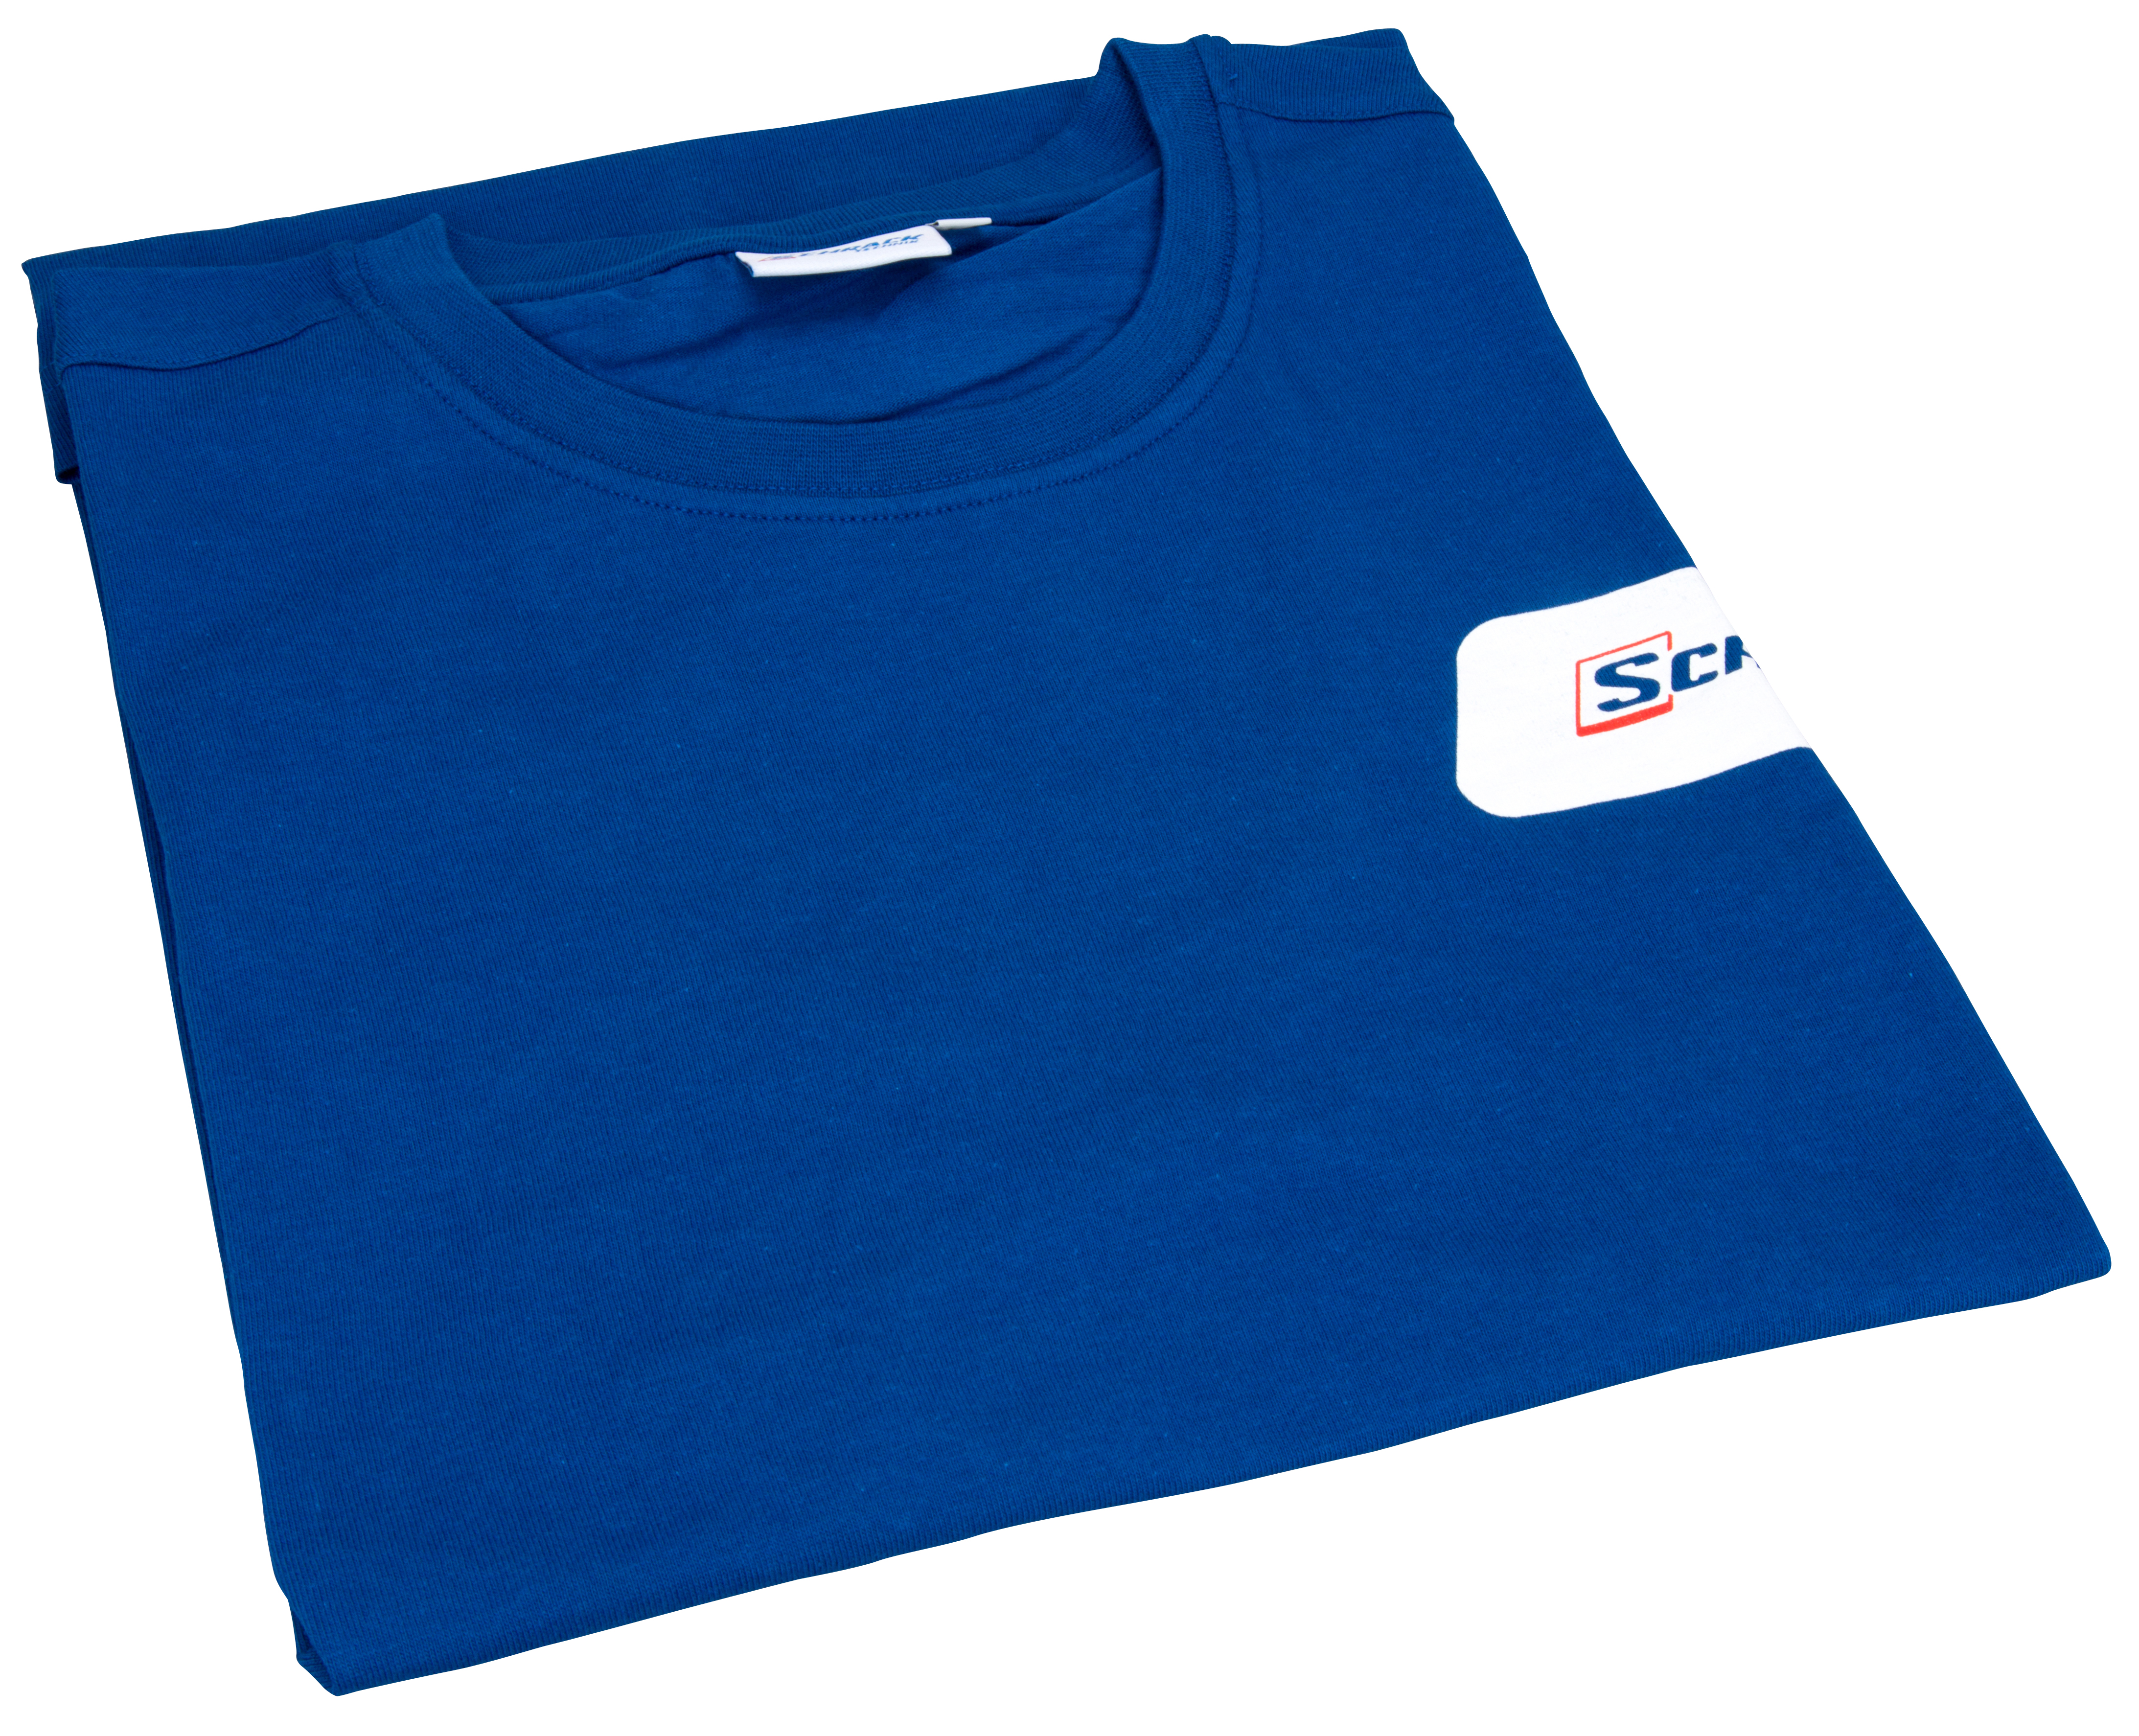 1 Stk T-Shirt Kurzarm blau -M- W-95000315